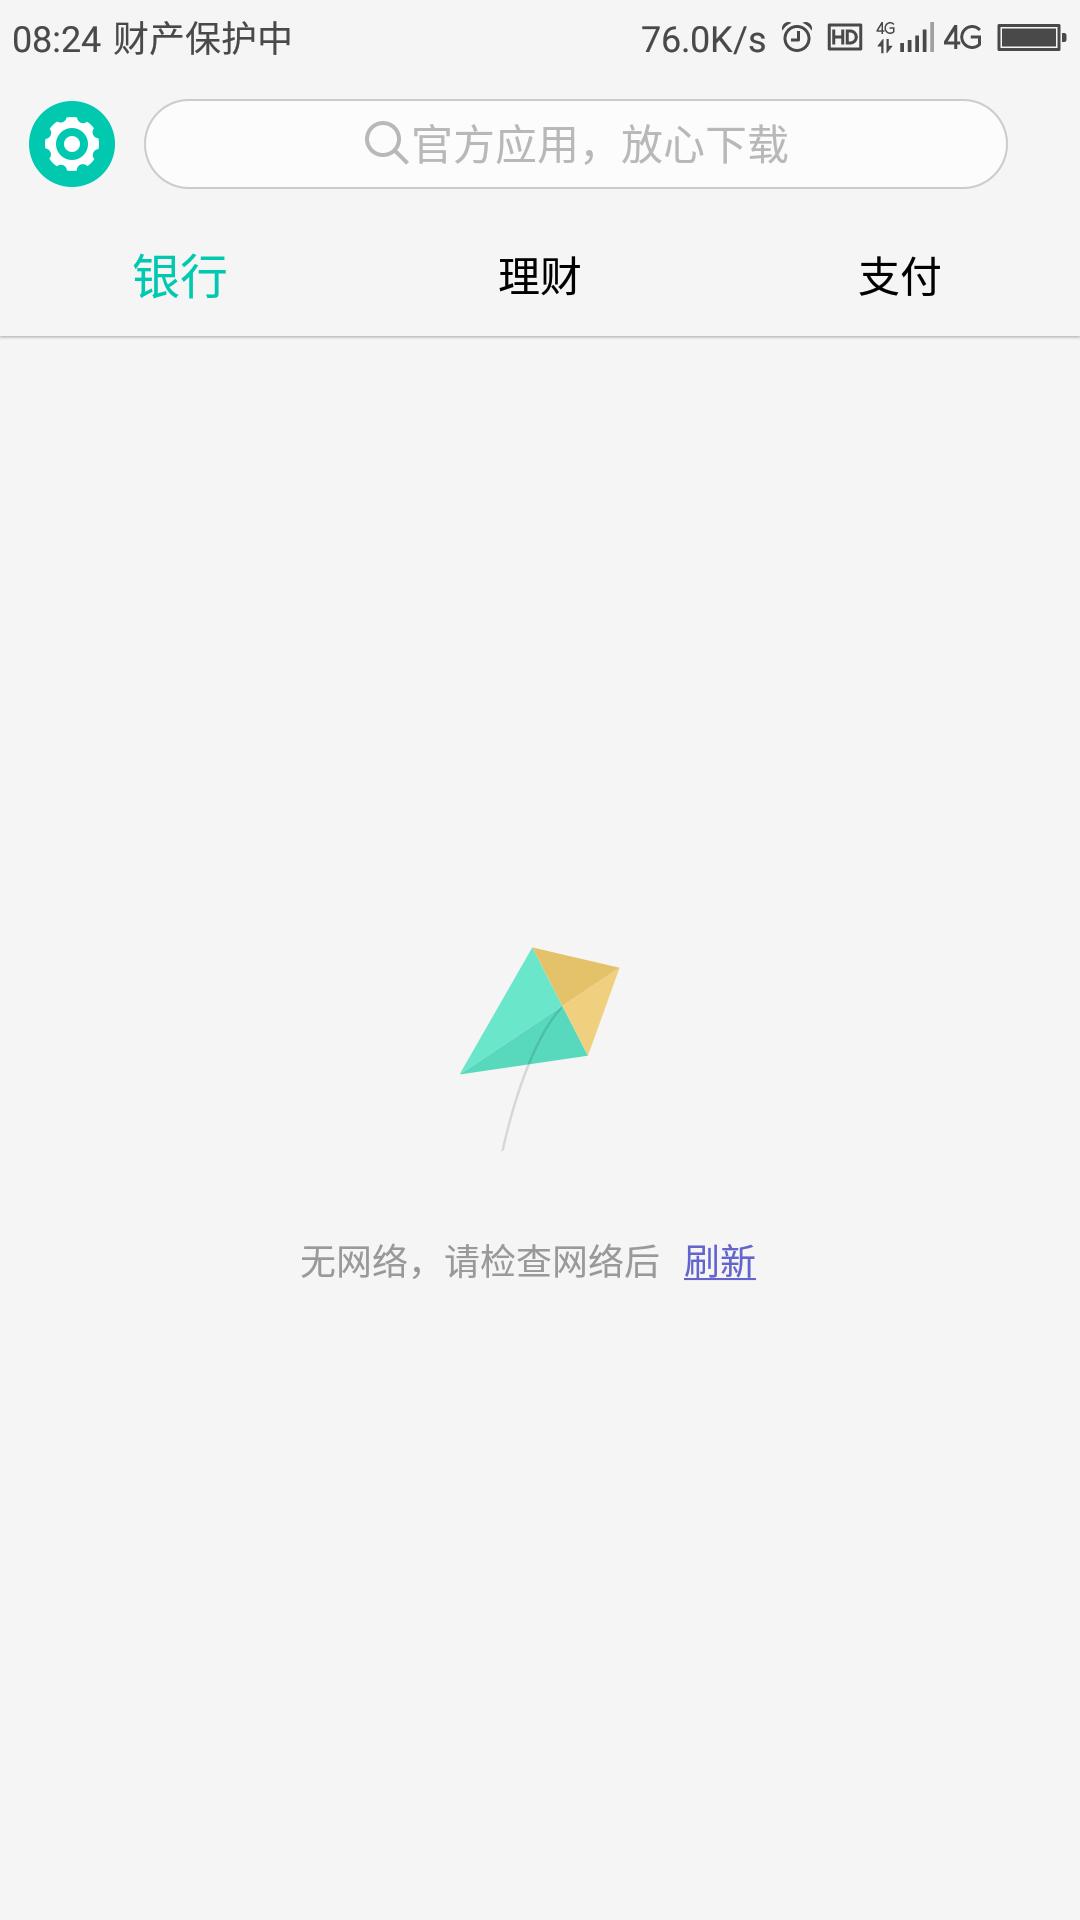 Screenshot_2018-10-27-08-24-19.png